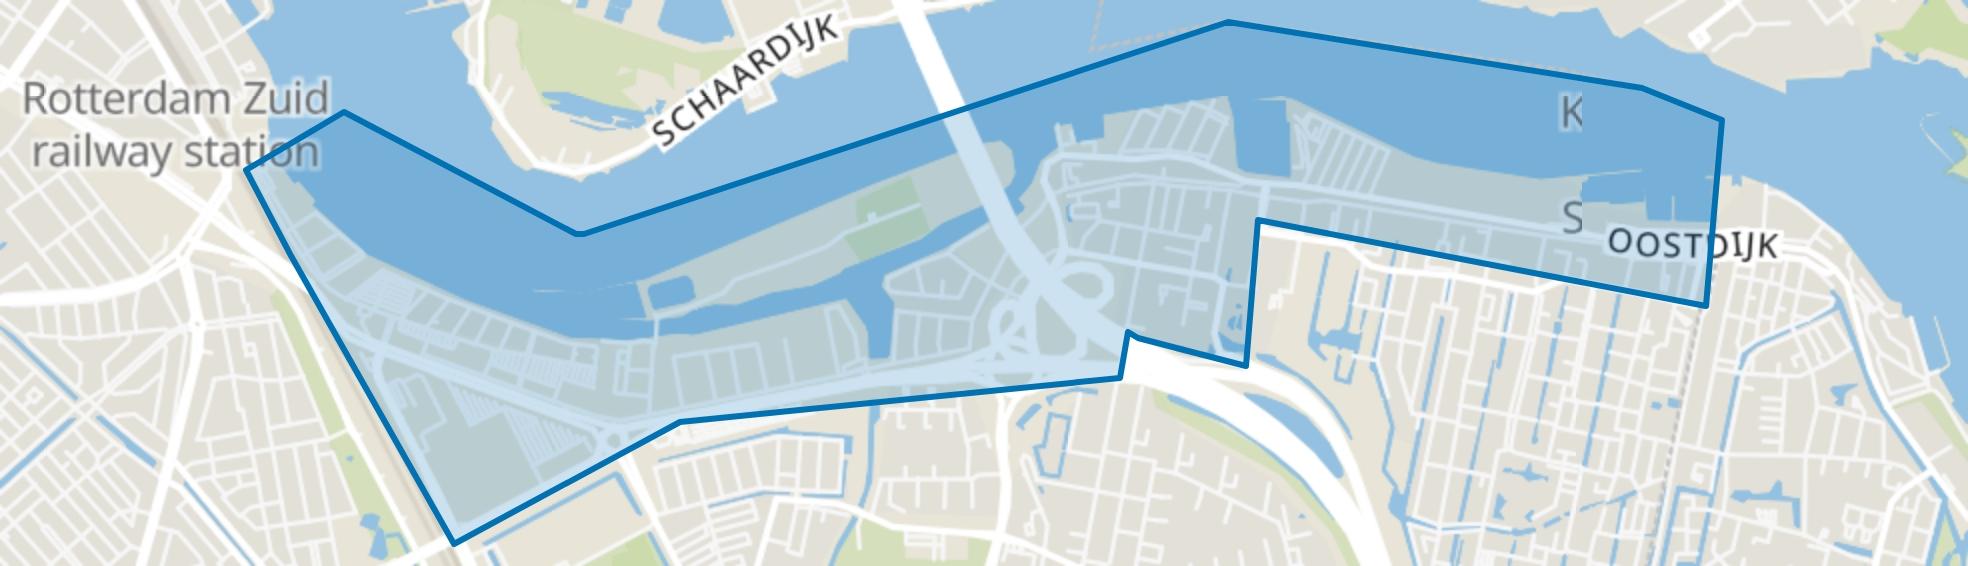 Oud IJsselmonde, Rotterdam map